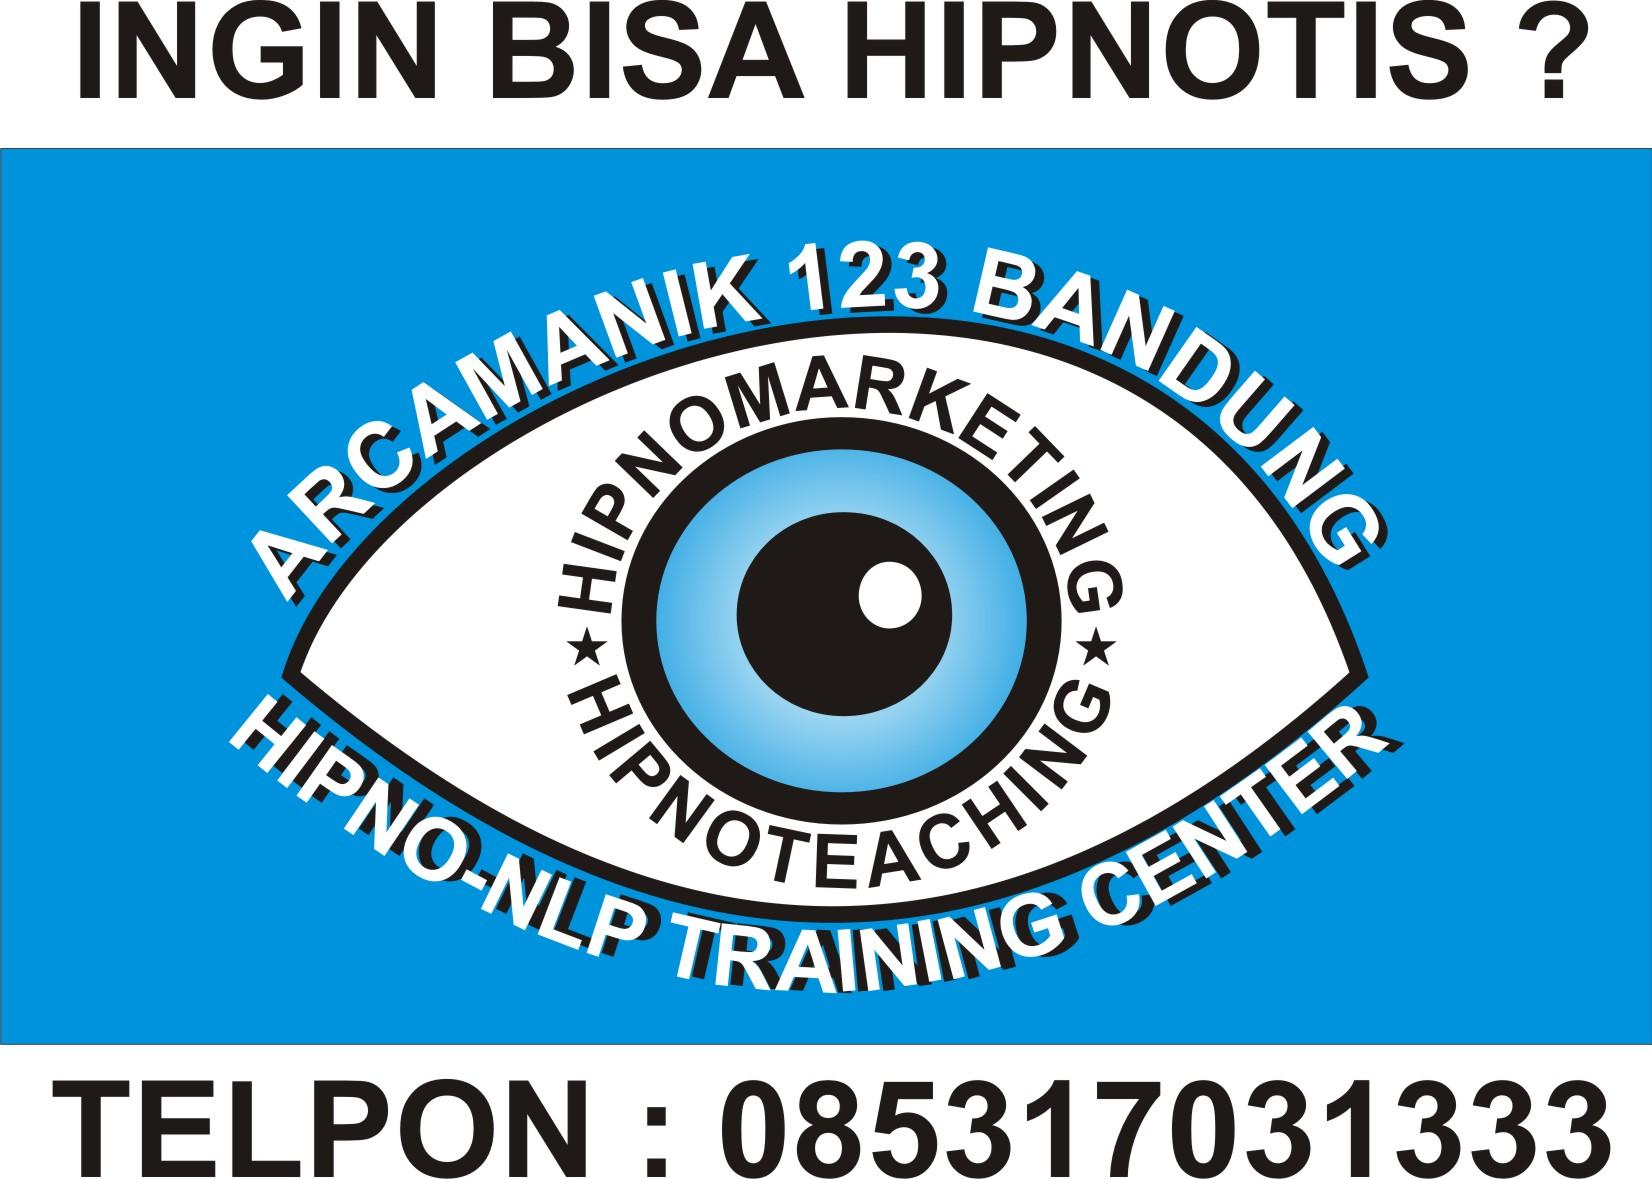 Pelatihan Privat Hipnoterapi, NLP dan Hipnotis di Jakarta, Bandung 085317031333